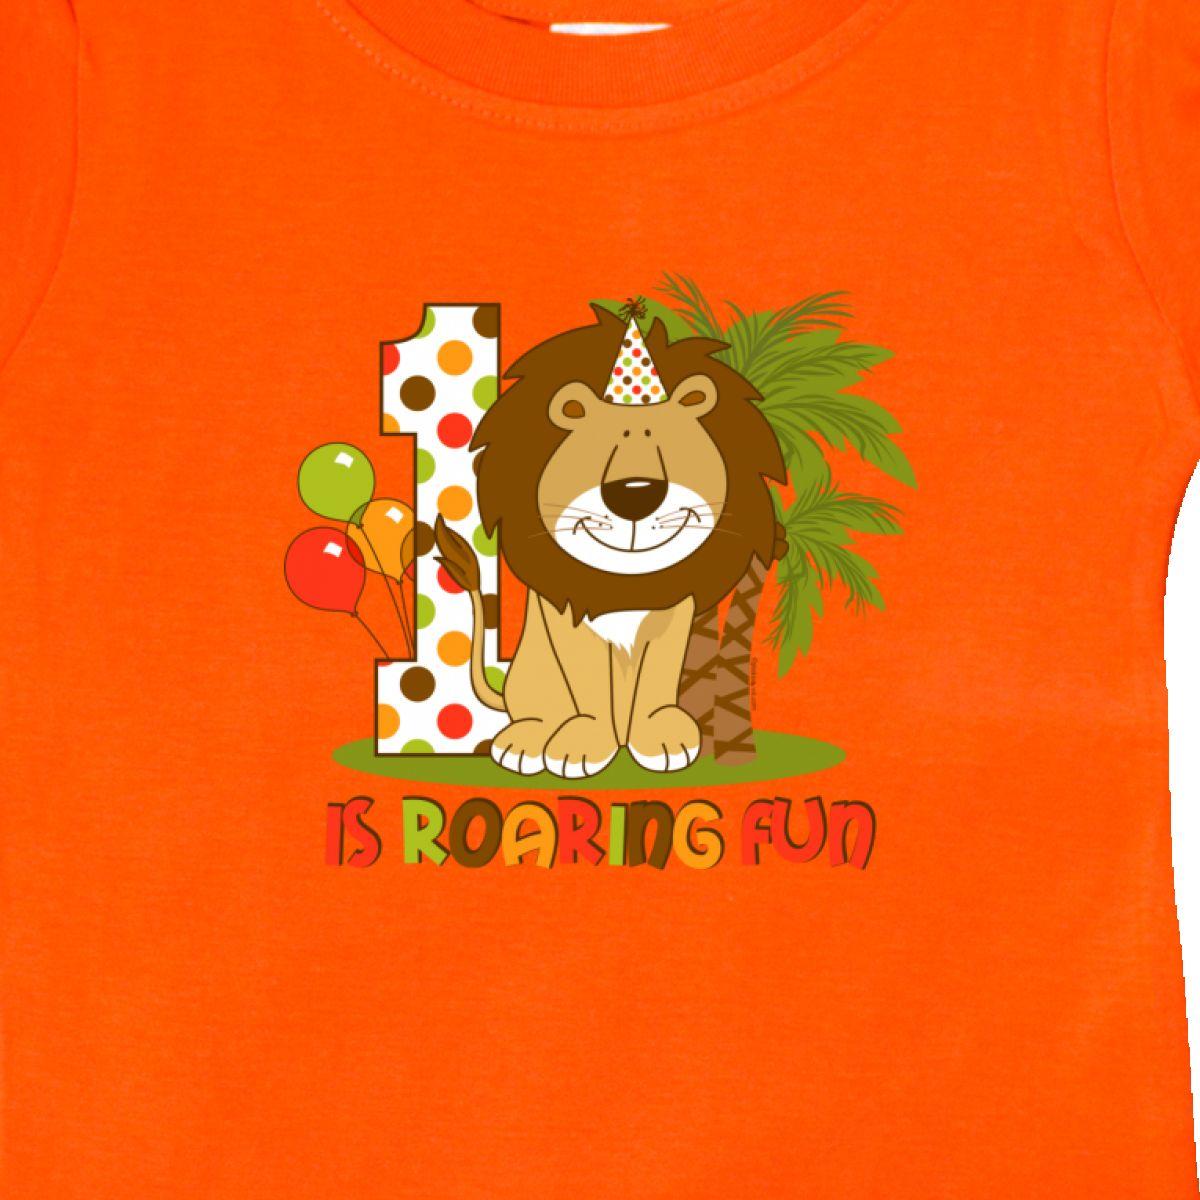 Inktastic-Cute-Lion-1st-Birthday-Baby-T-Shirt-Roaring-Fun-Pinkinkartkids-First thumbnail 16